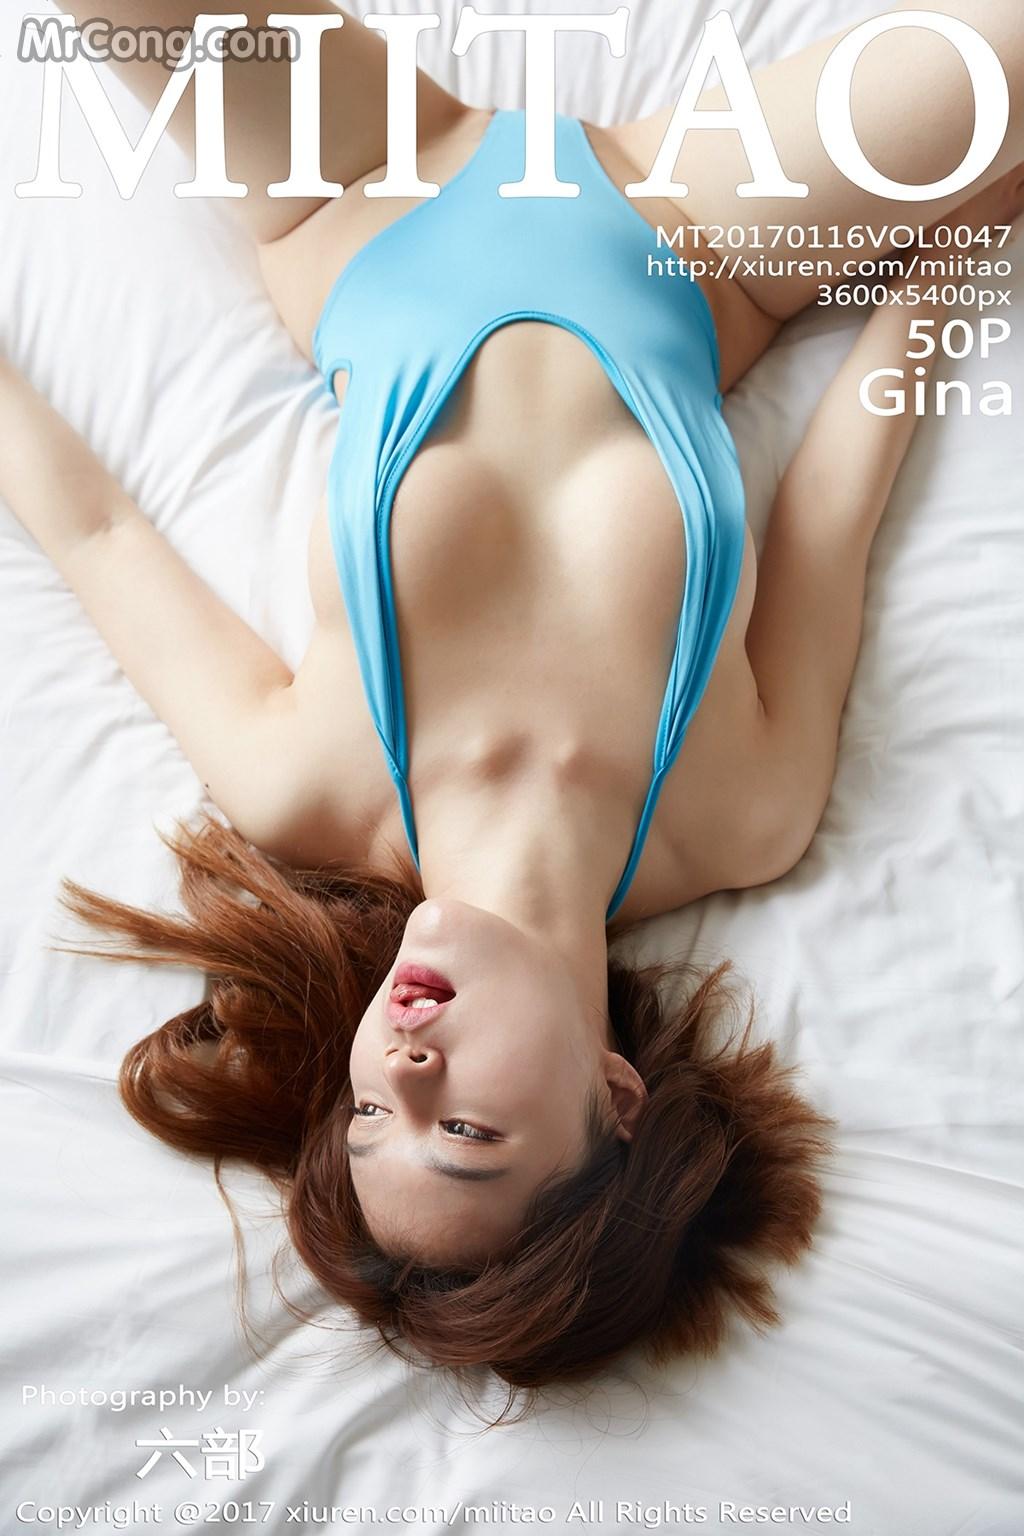 MiiTao Vol.047: Người mẫu Gina (51 ảnh)